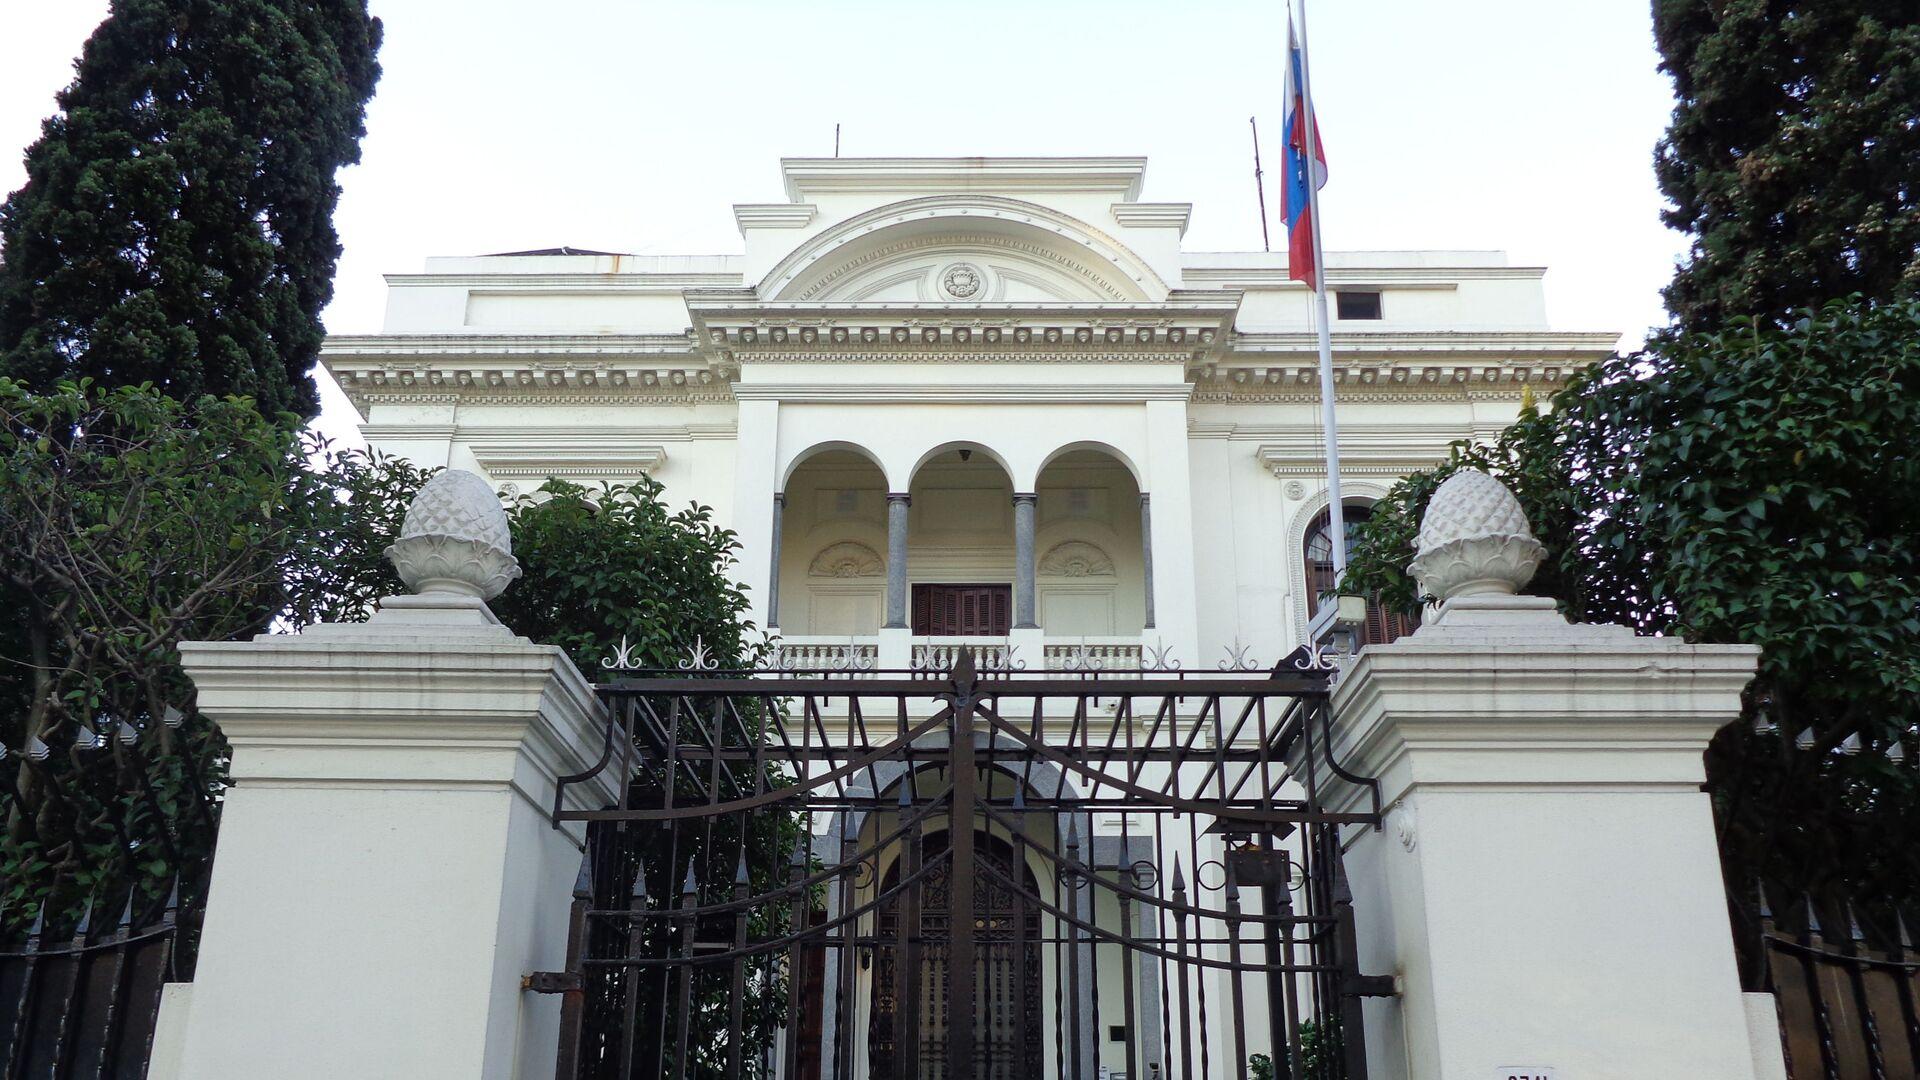 Embajada de Rusia en Uruguay - Sputnik Mundo, 1920, 09.02.2021